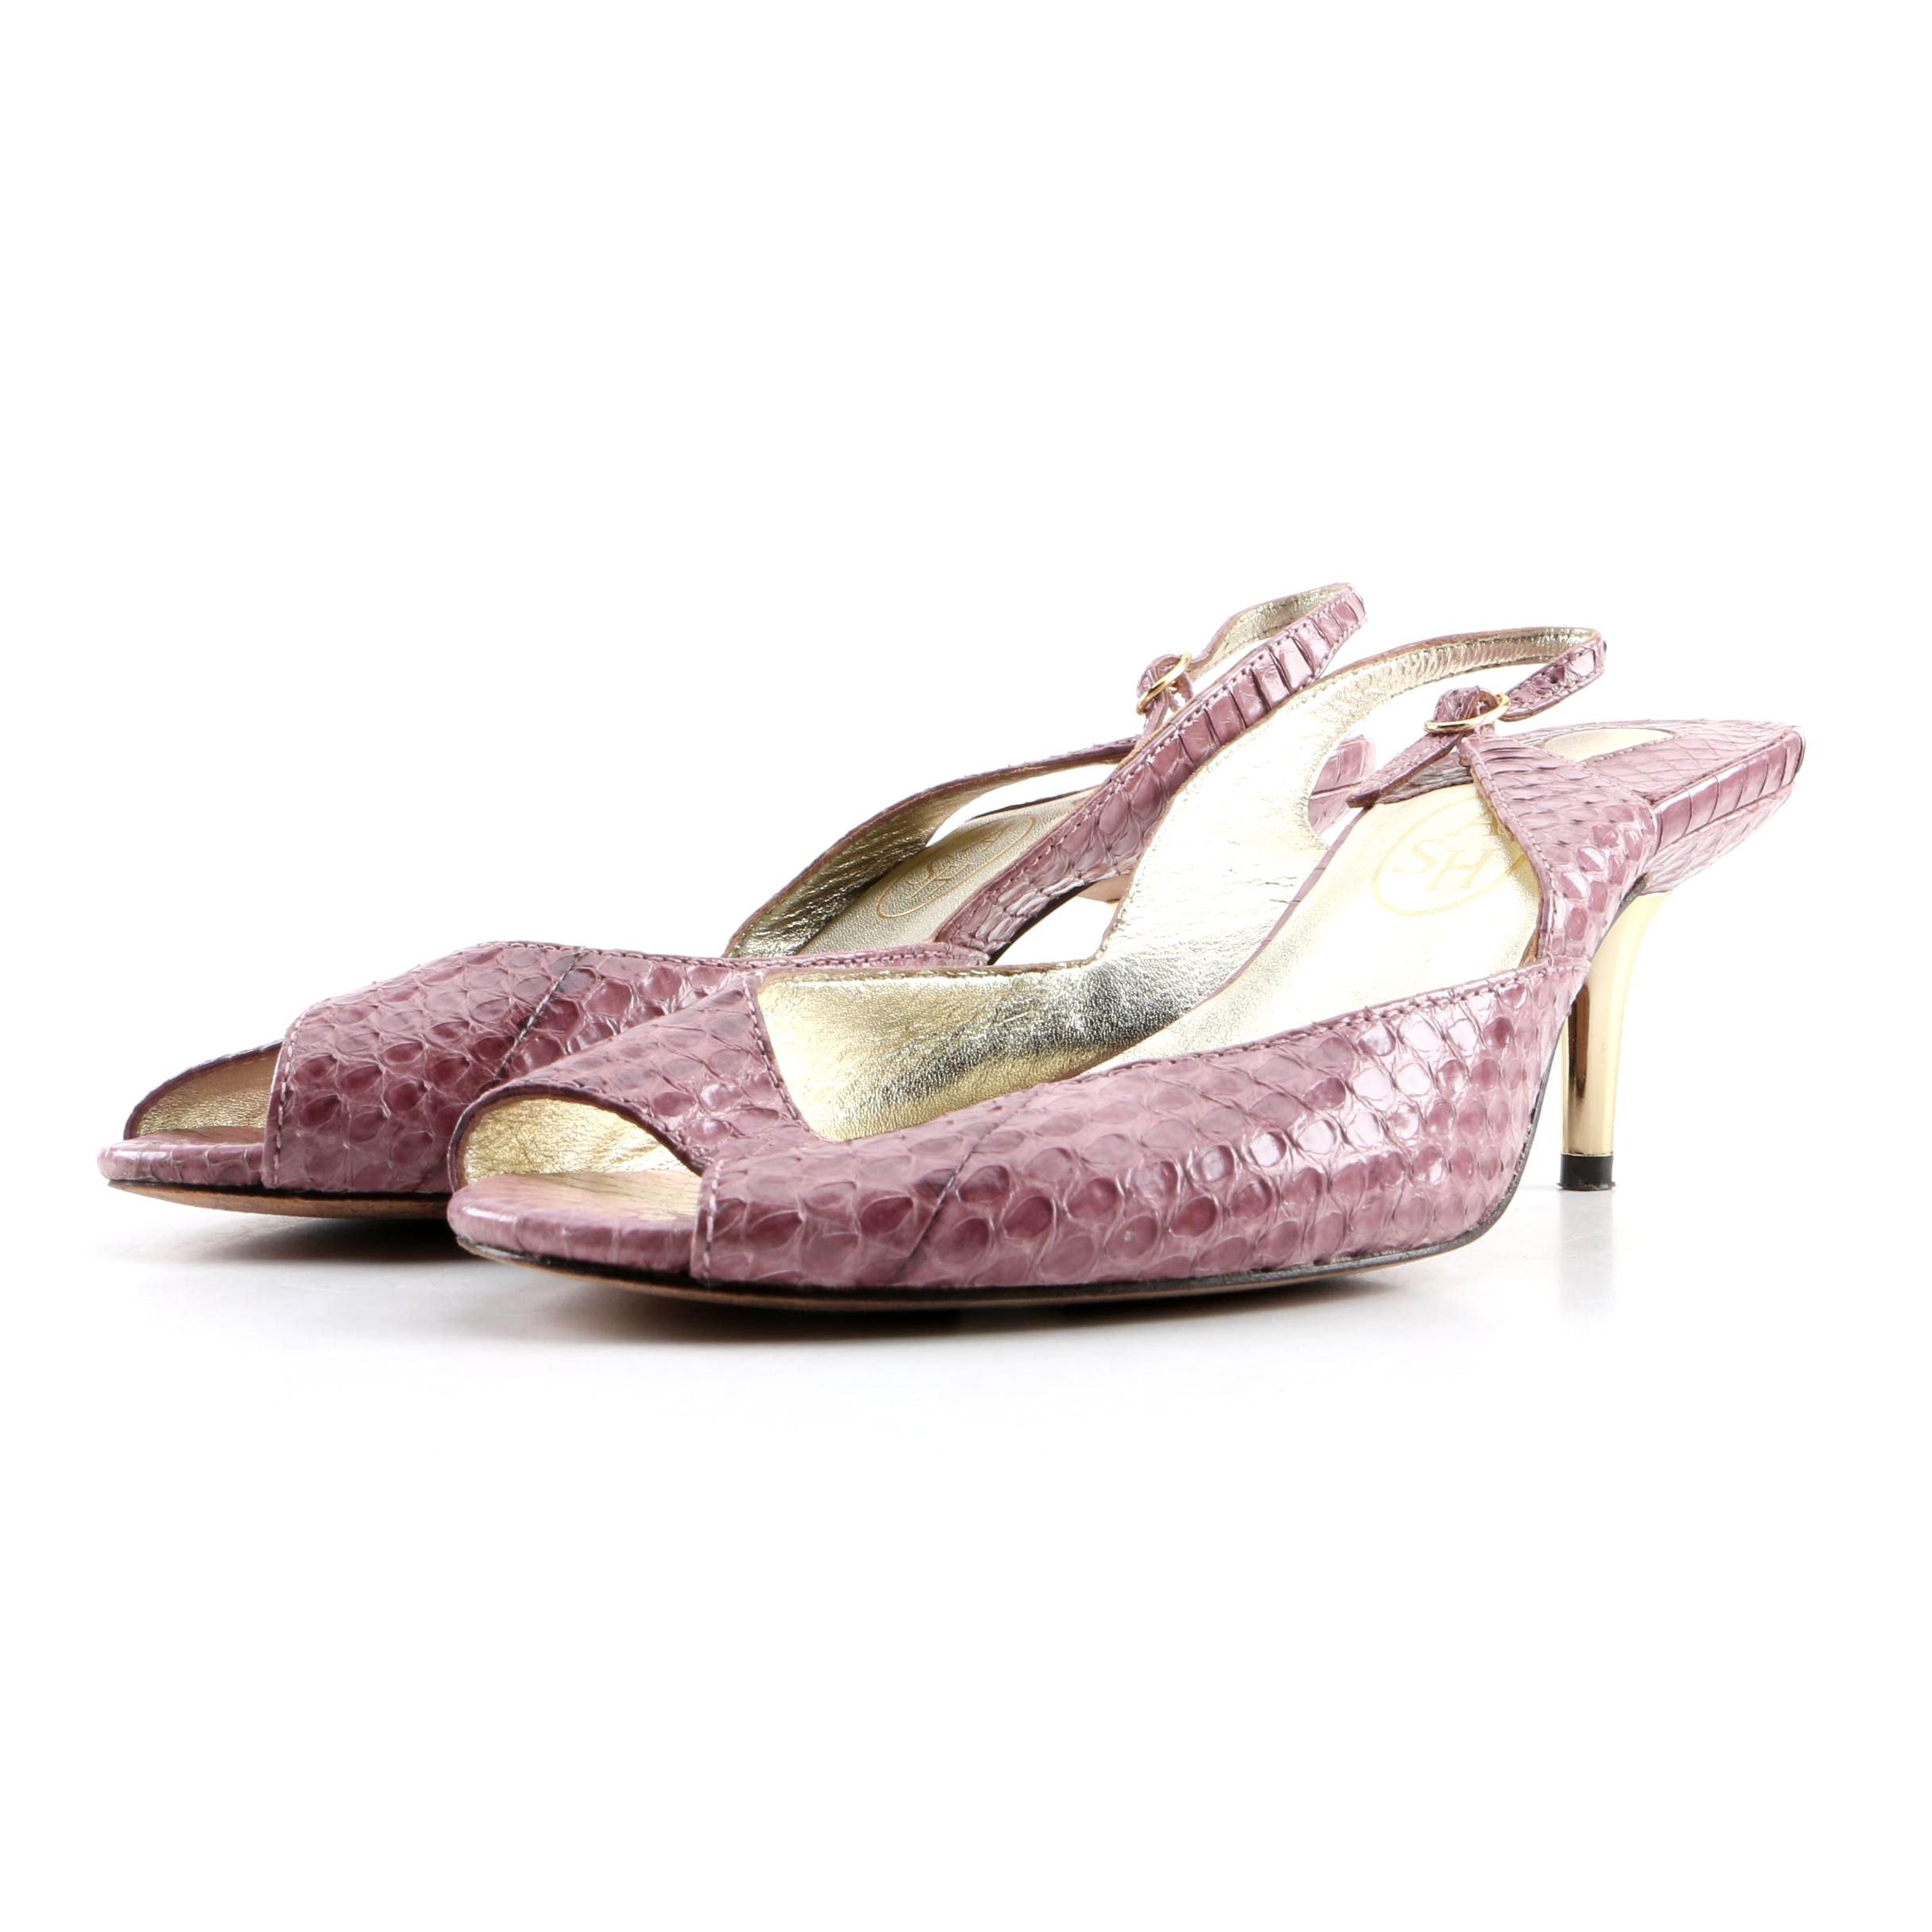 Ash Brand Mauve Dyed Snakeskin Slingback Sandals